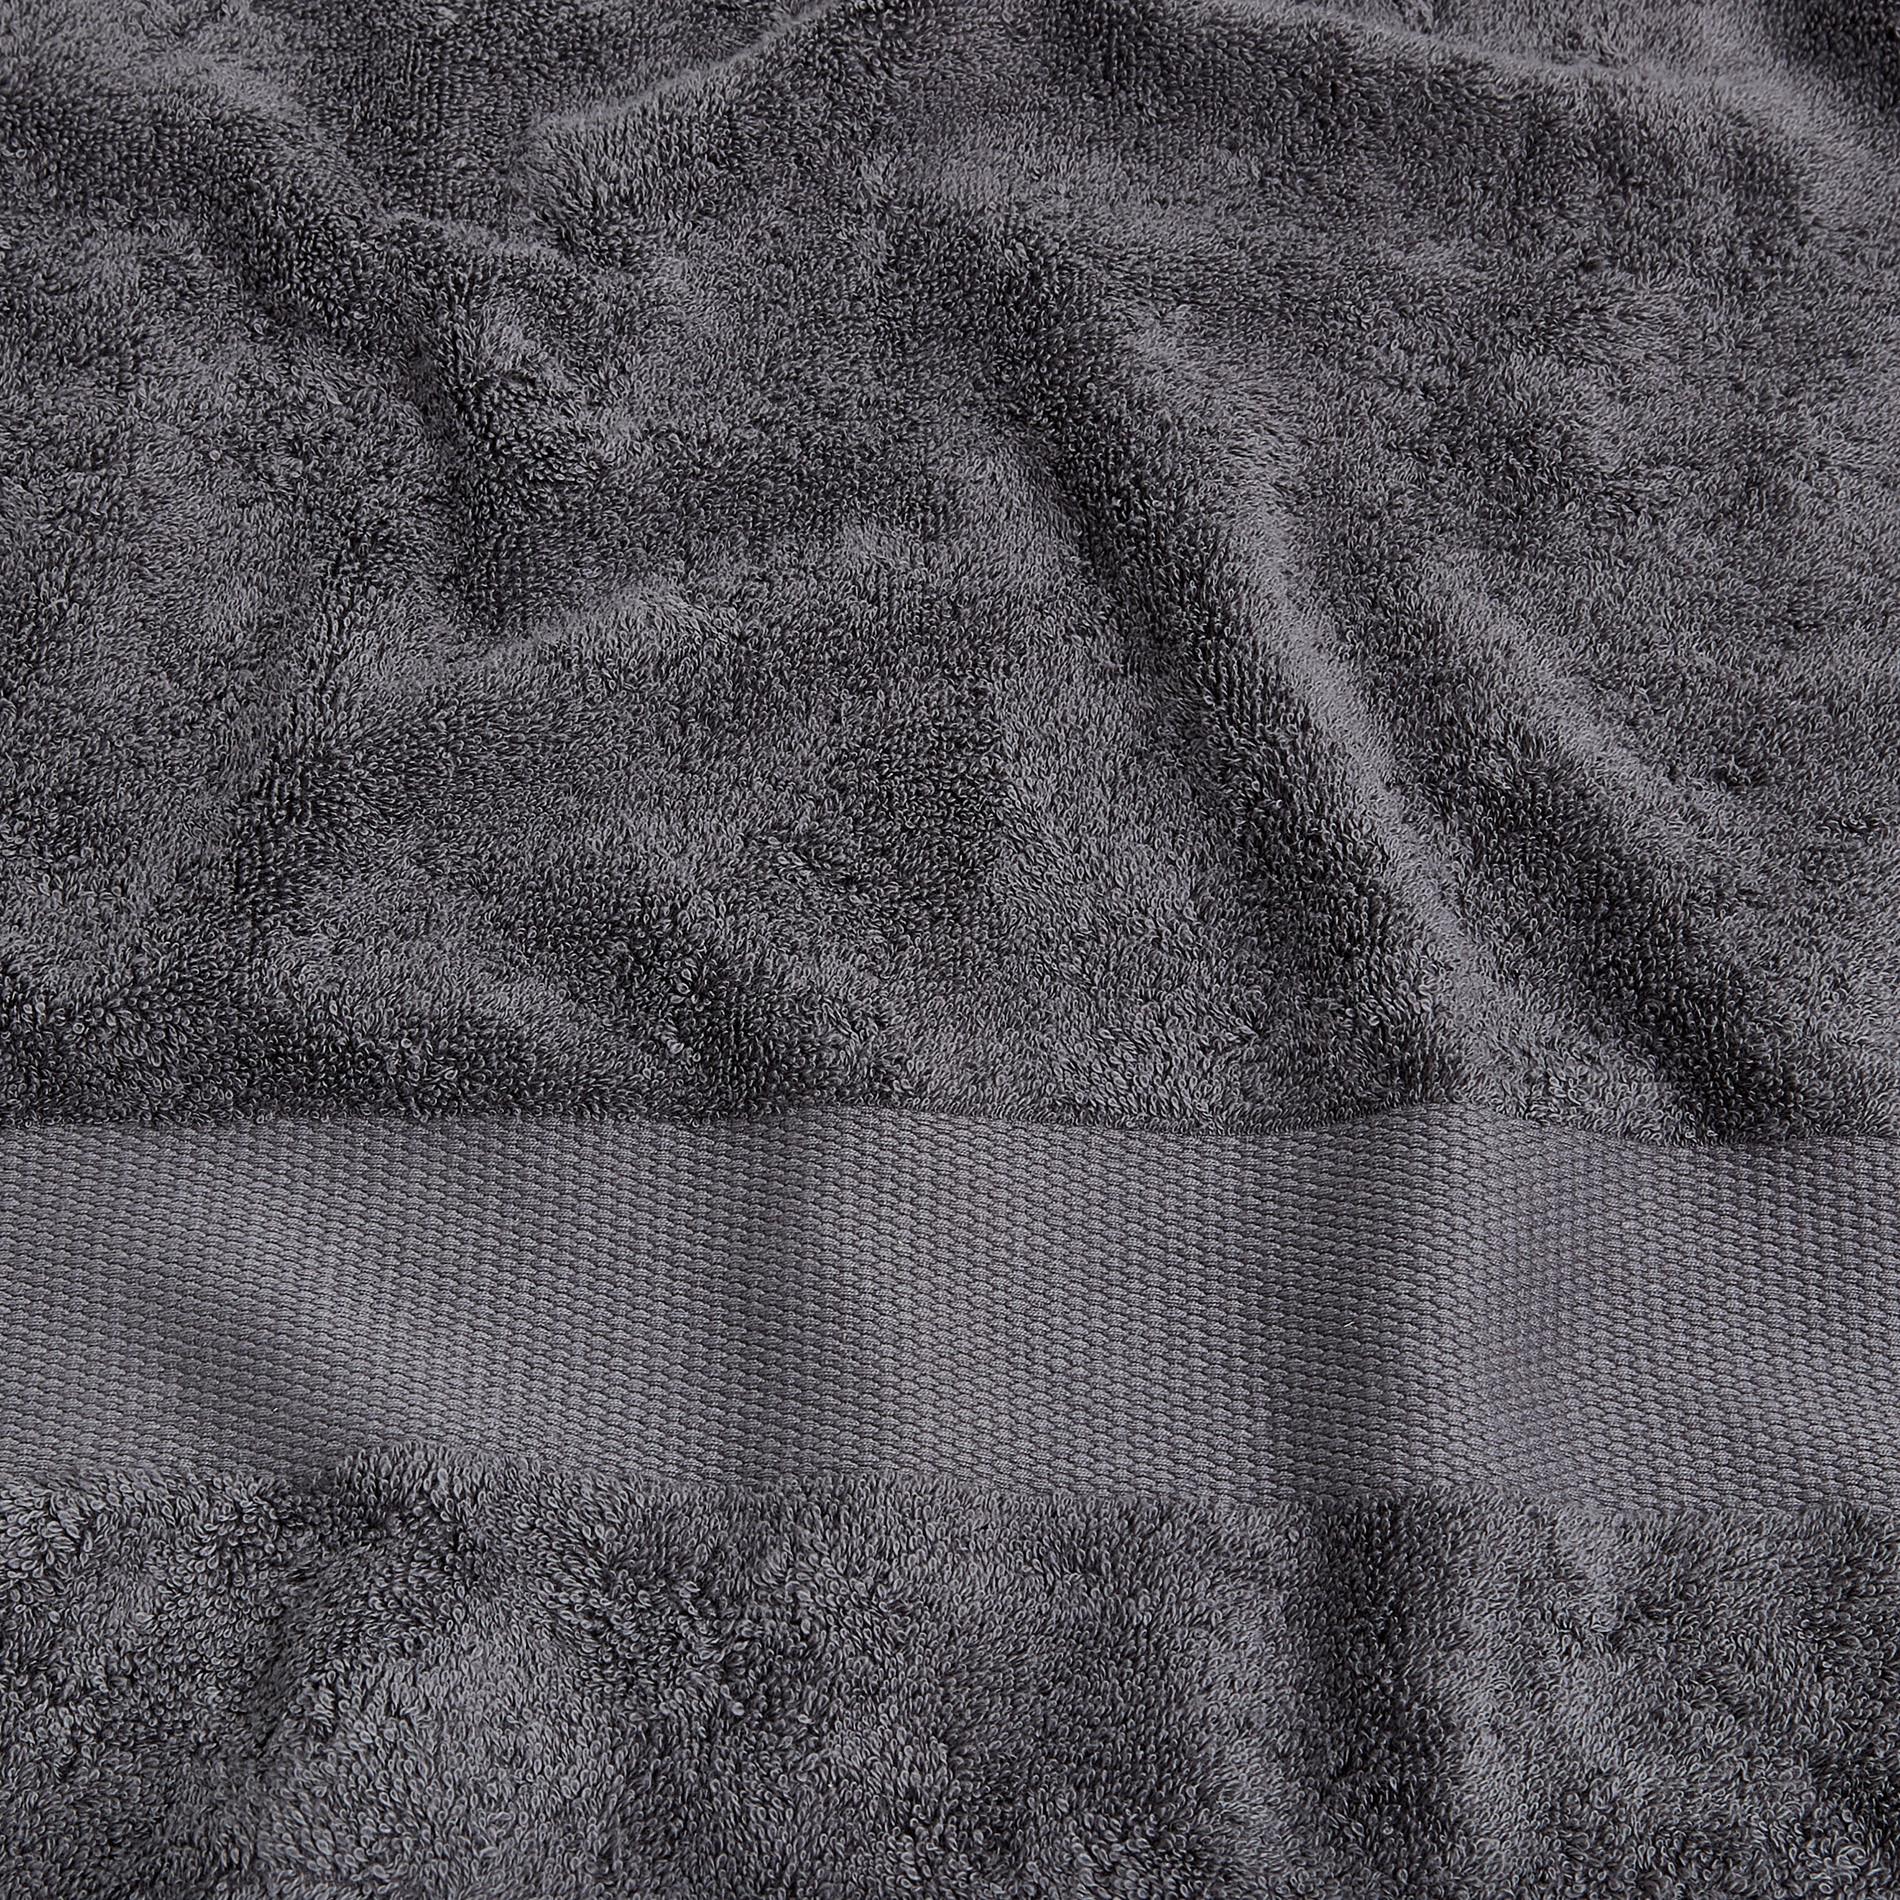 Asciugamano spugna di puro cotone Zefiro, Grigio scuro, large image number 3